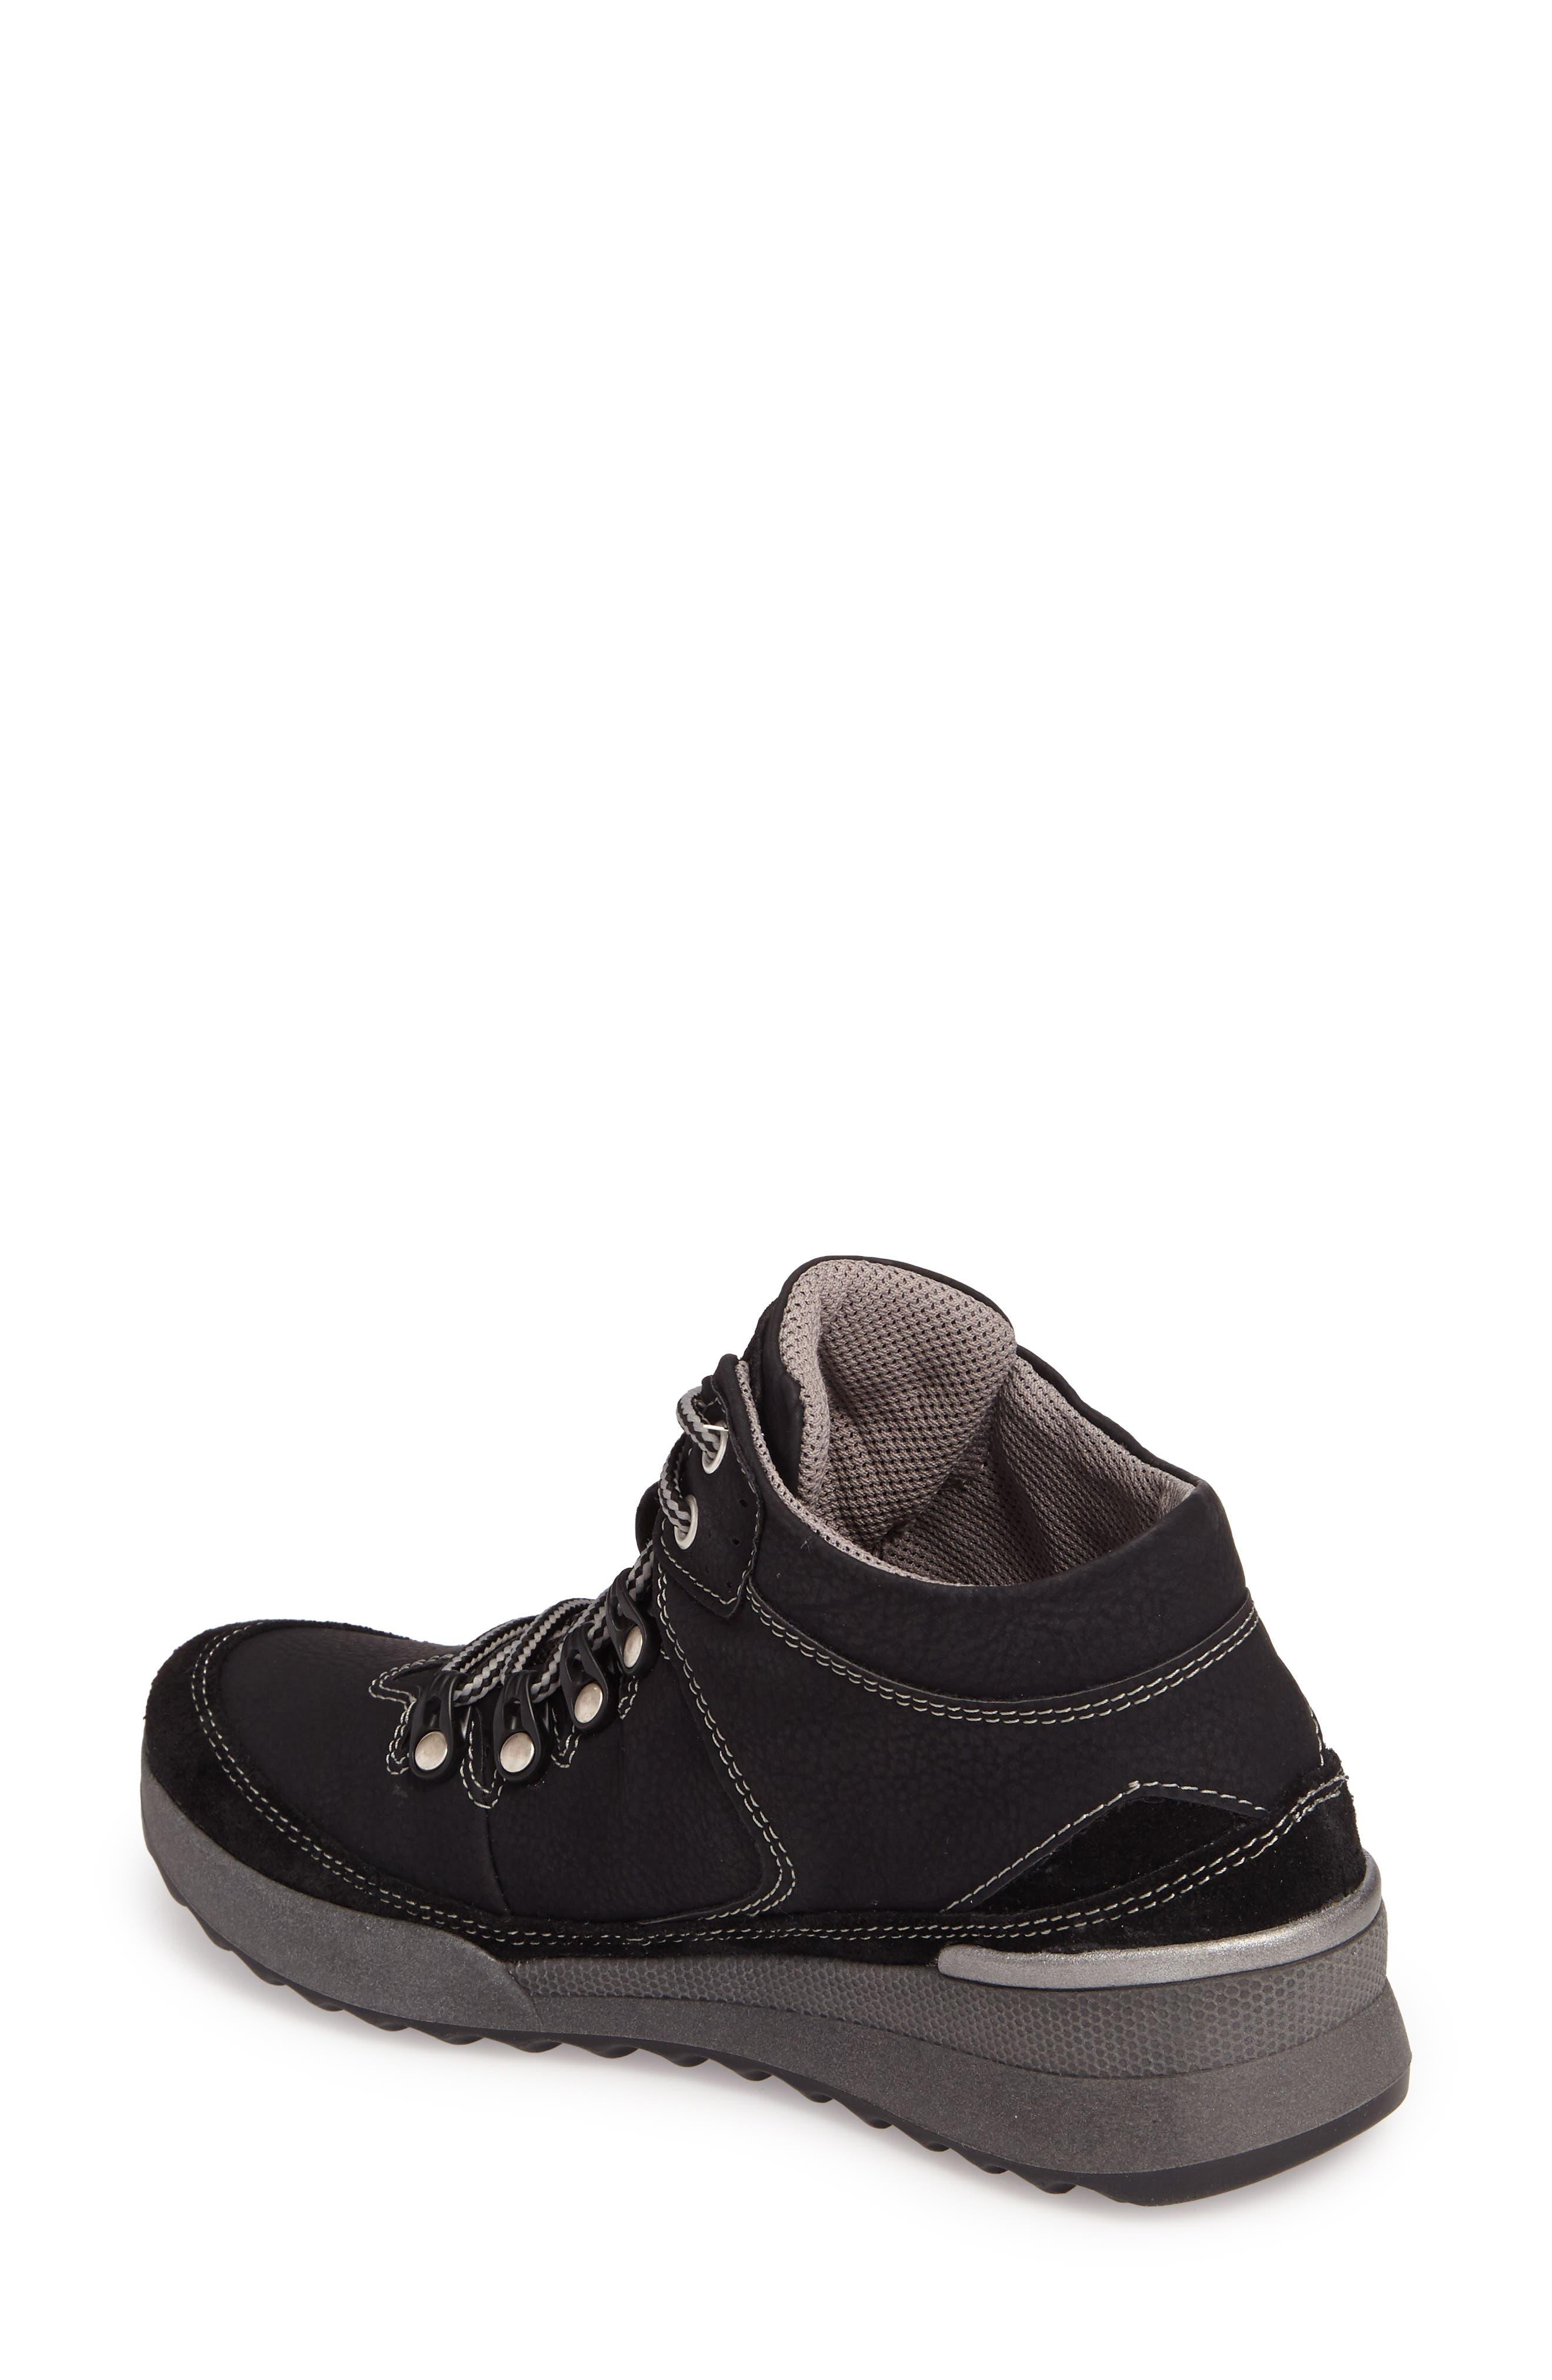 Victoria 05 Waterproof Sneaker,                             Alternate thumbnail 2, color,                             BLACK/ KOMBI LEATHER